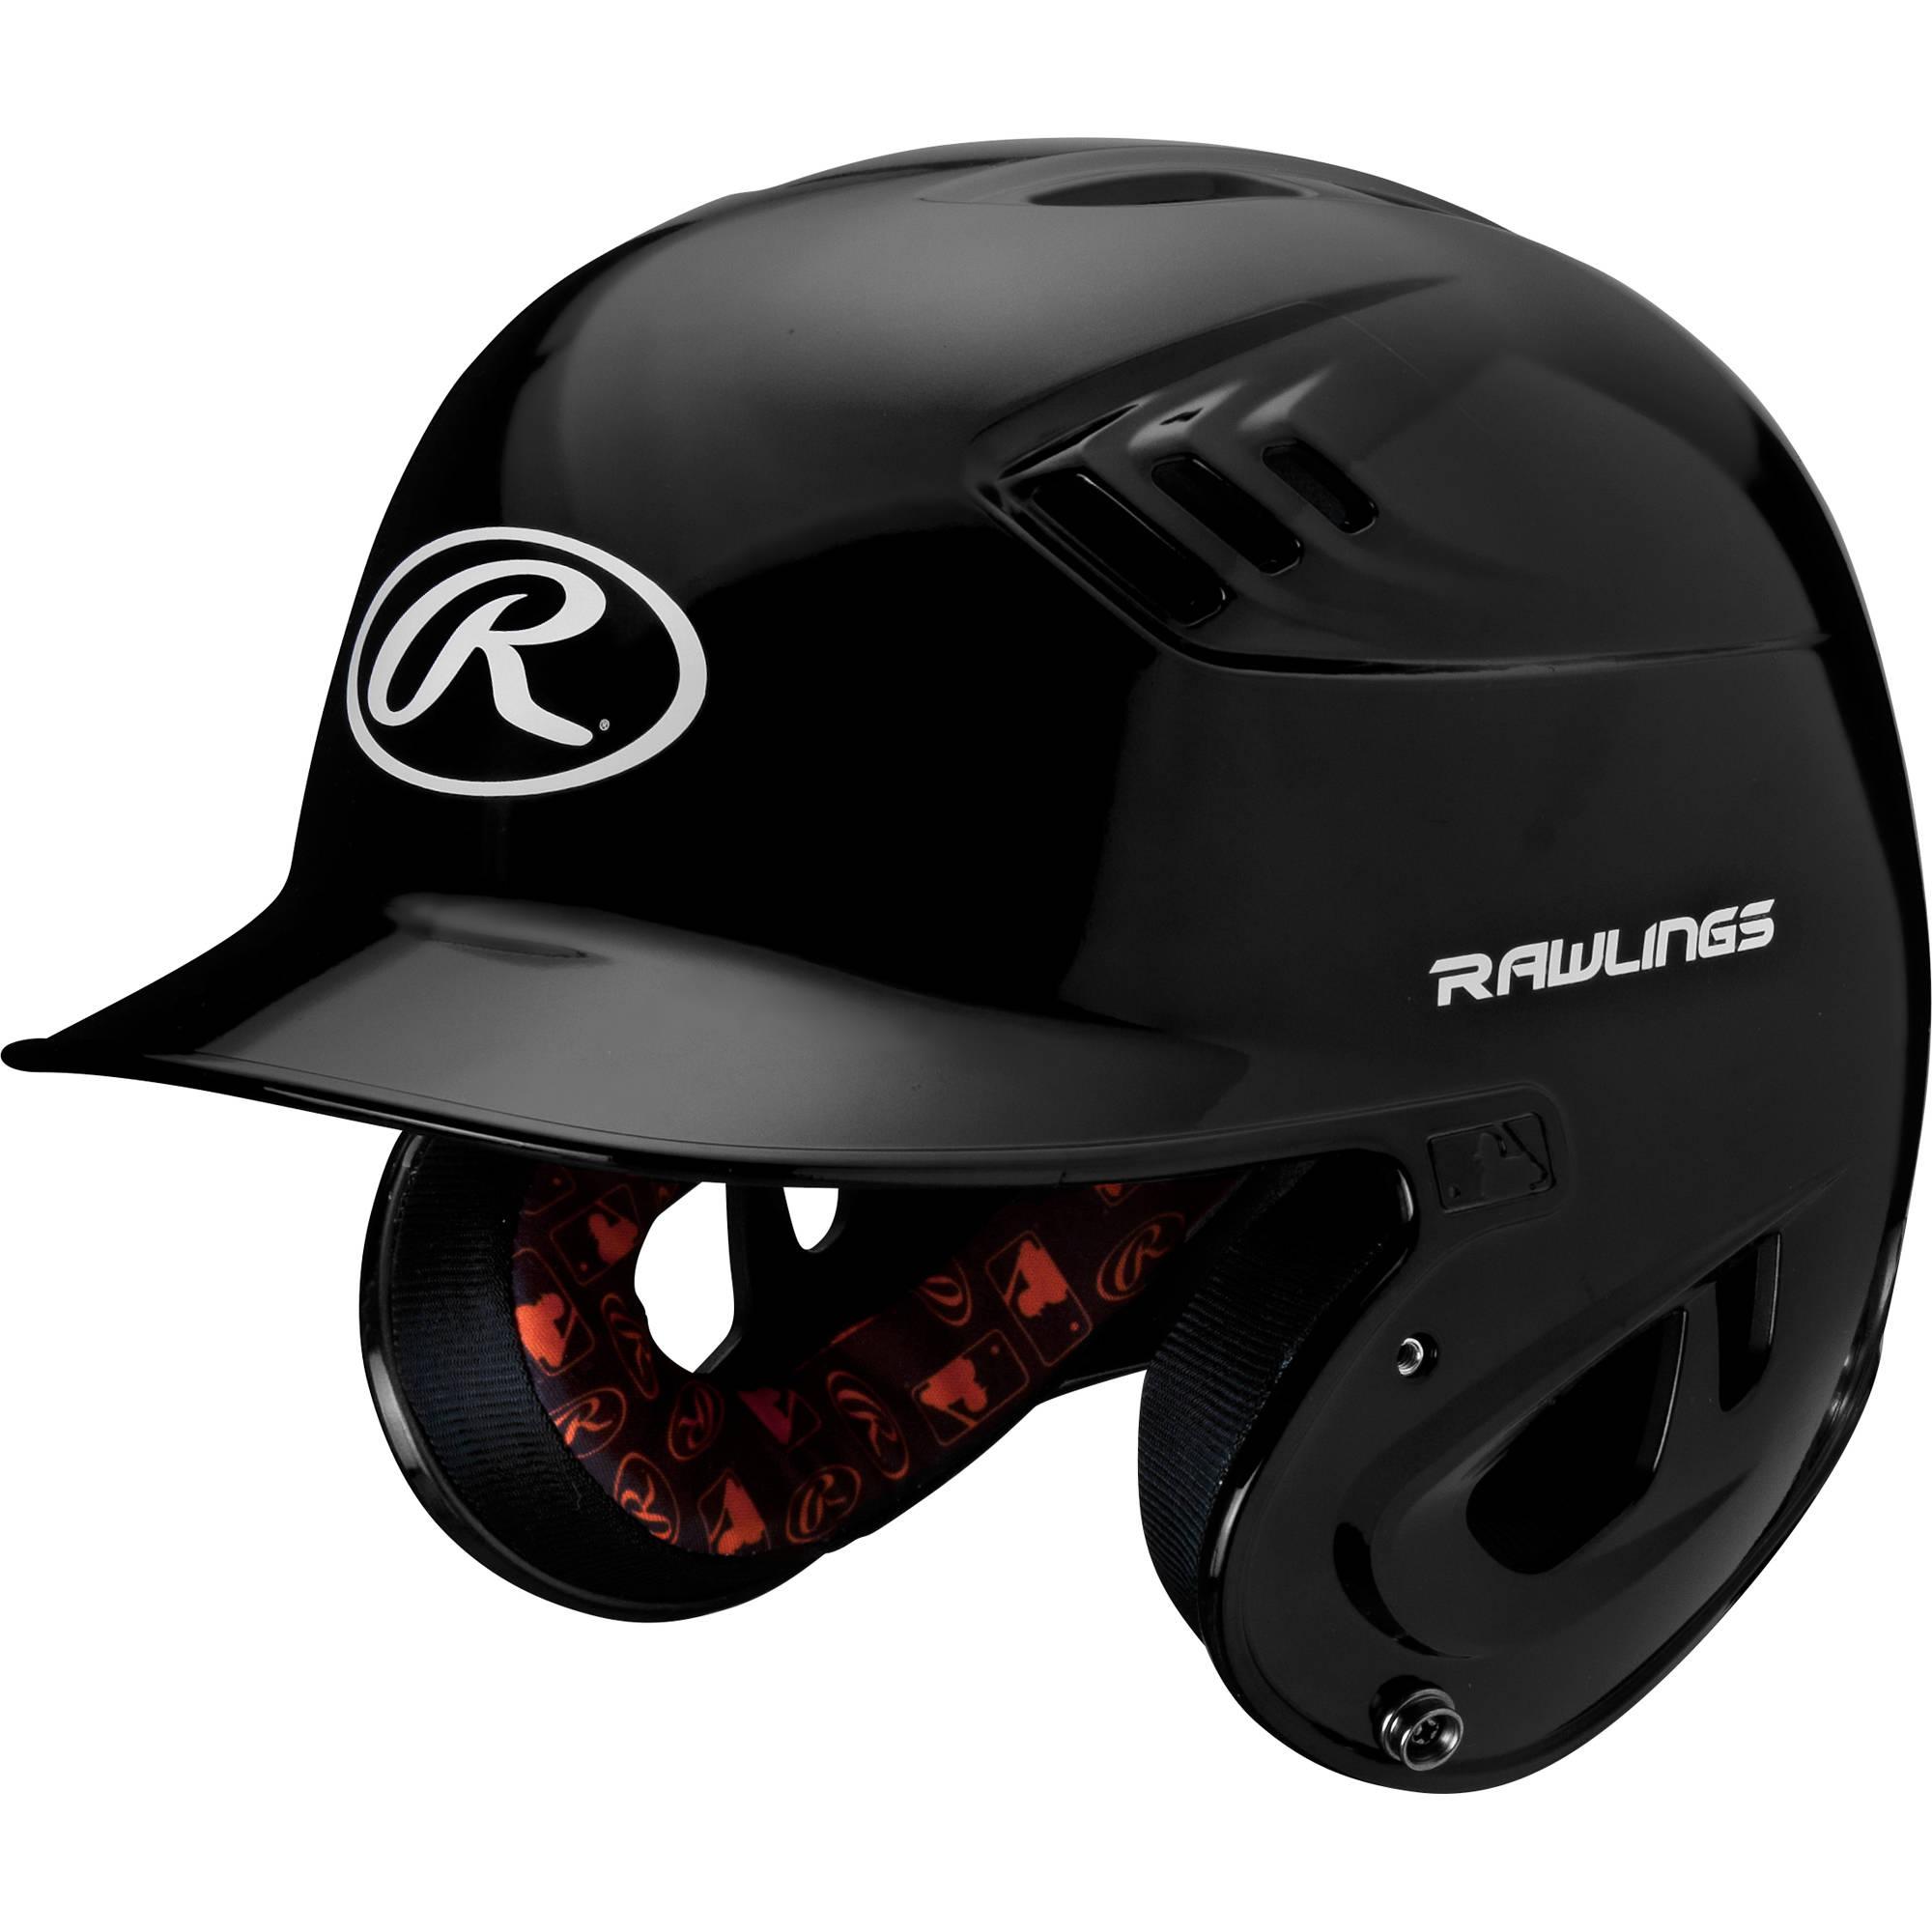 Rawlings Senior R16 Series Metallic Batting Helmet